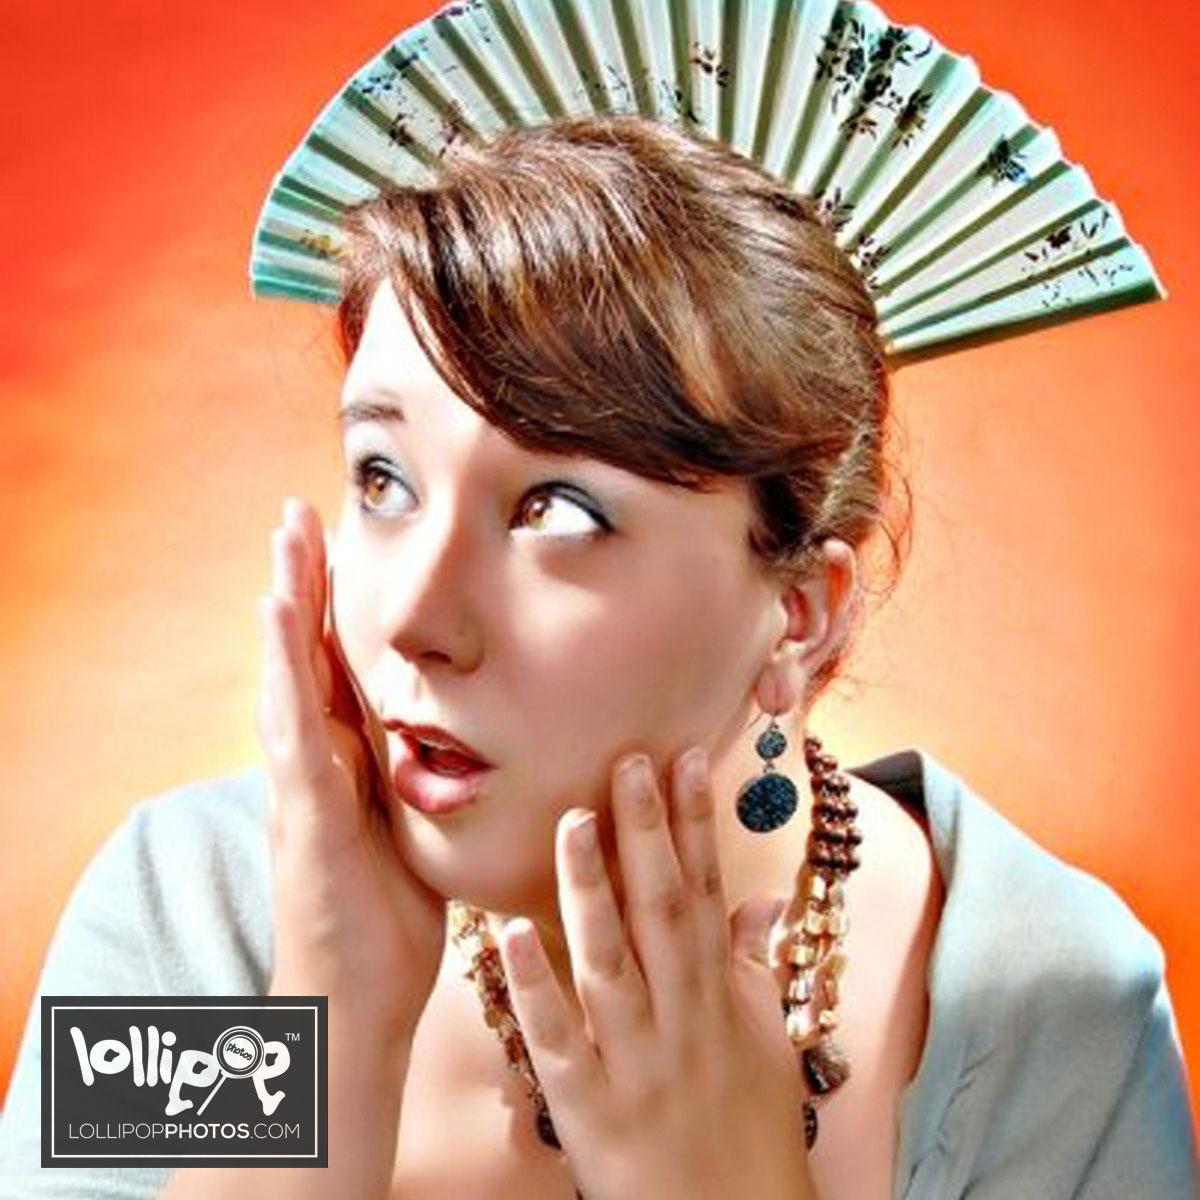 msdig-nora-canfield-lollipop-photos-118.jpg